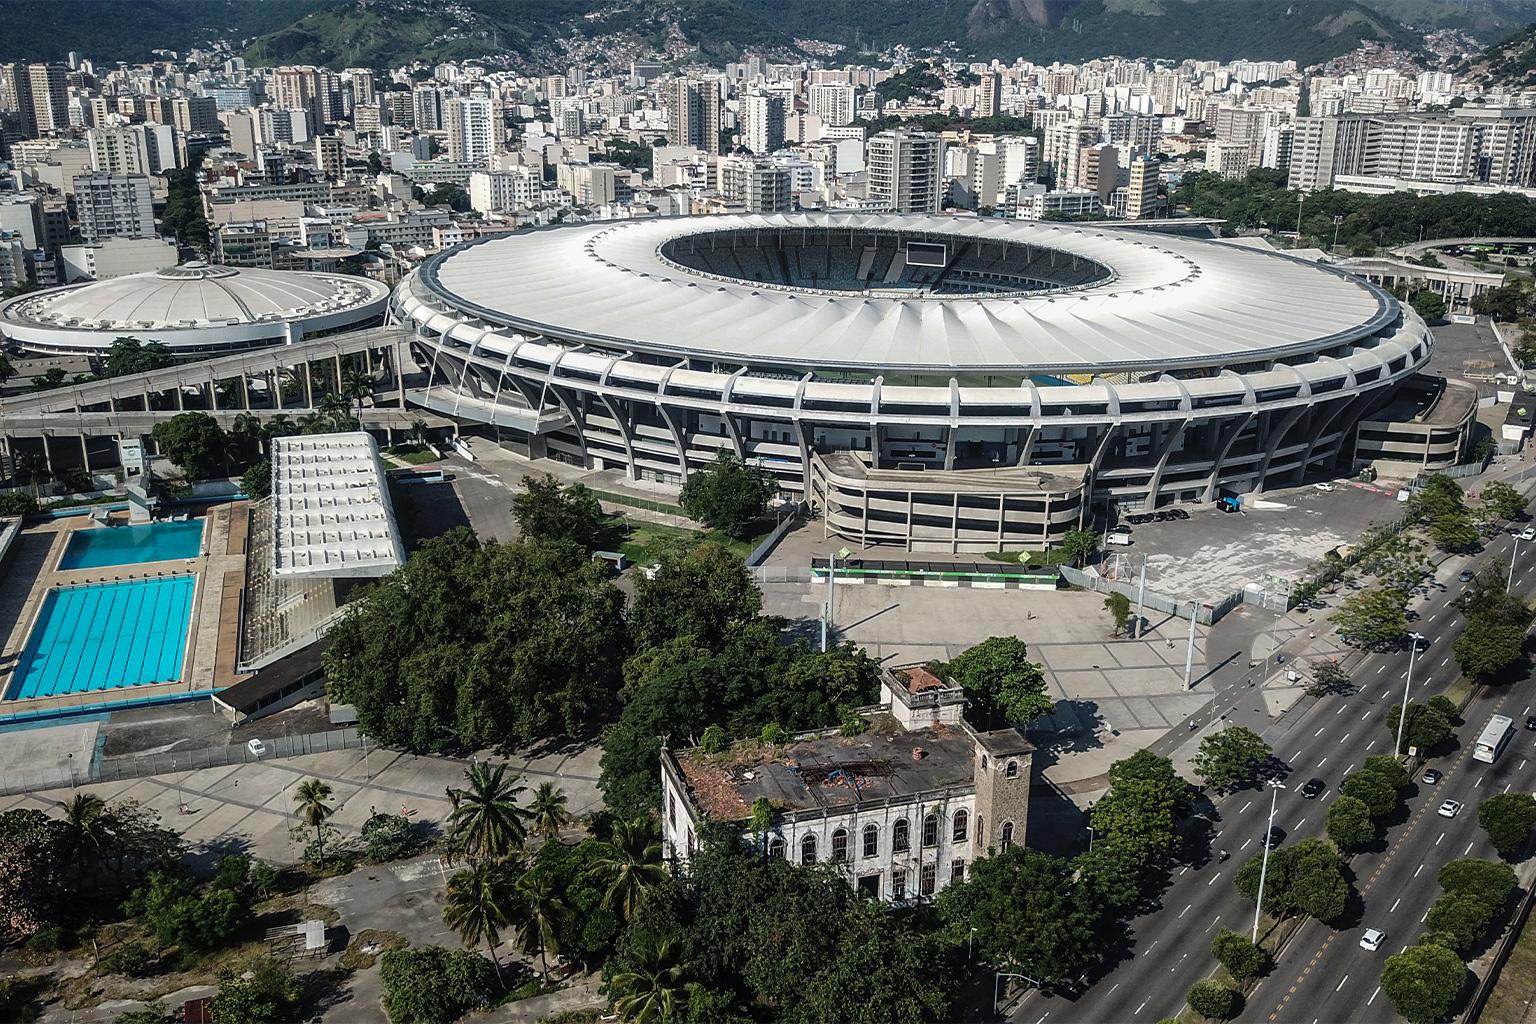 Aerial view of a building beside the Maracanã stadium.